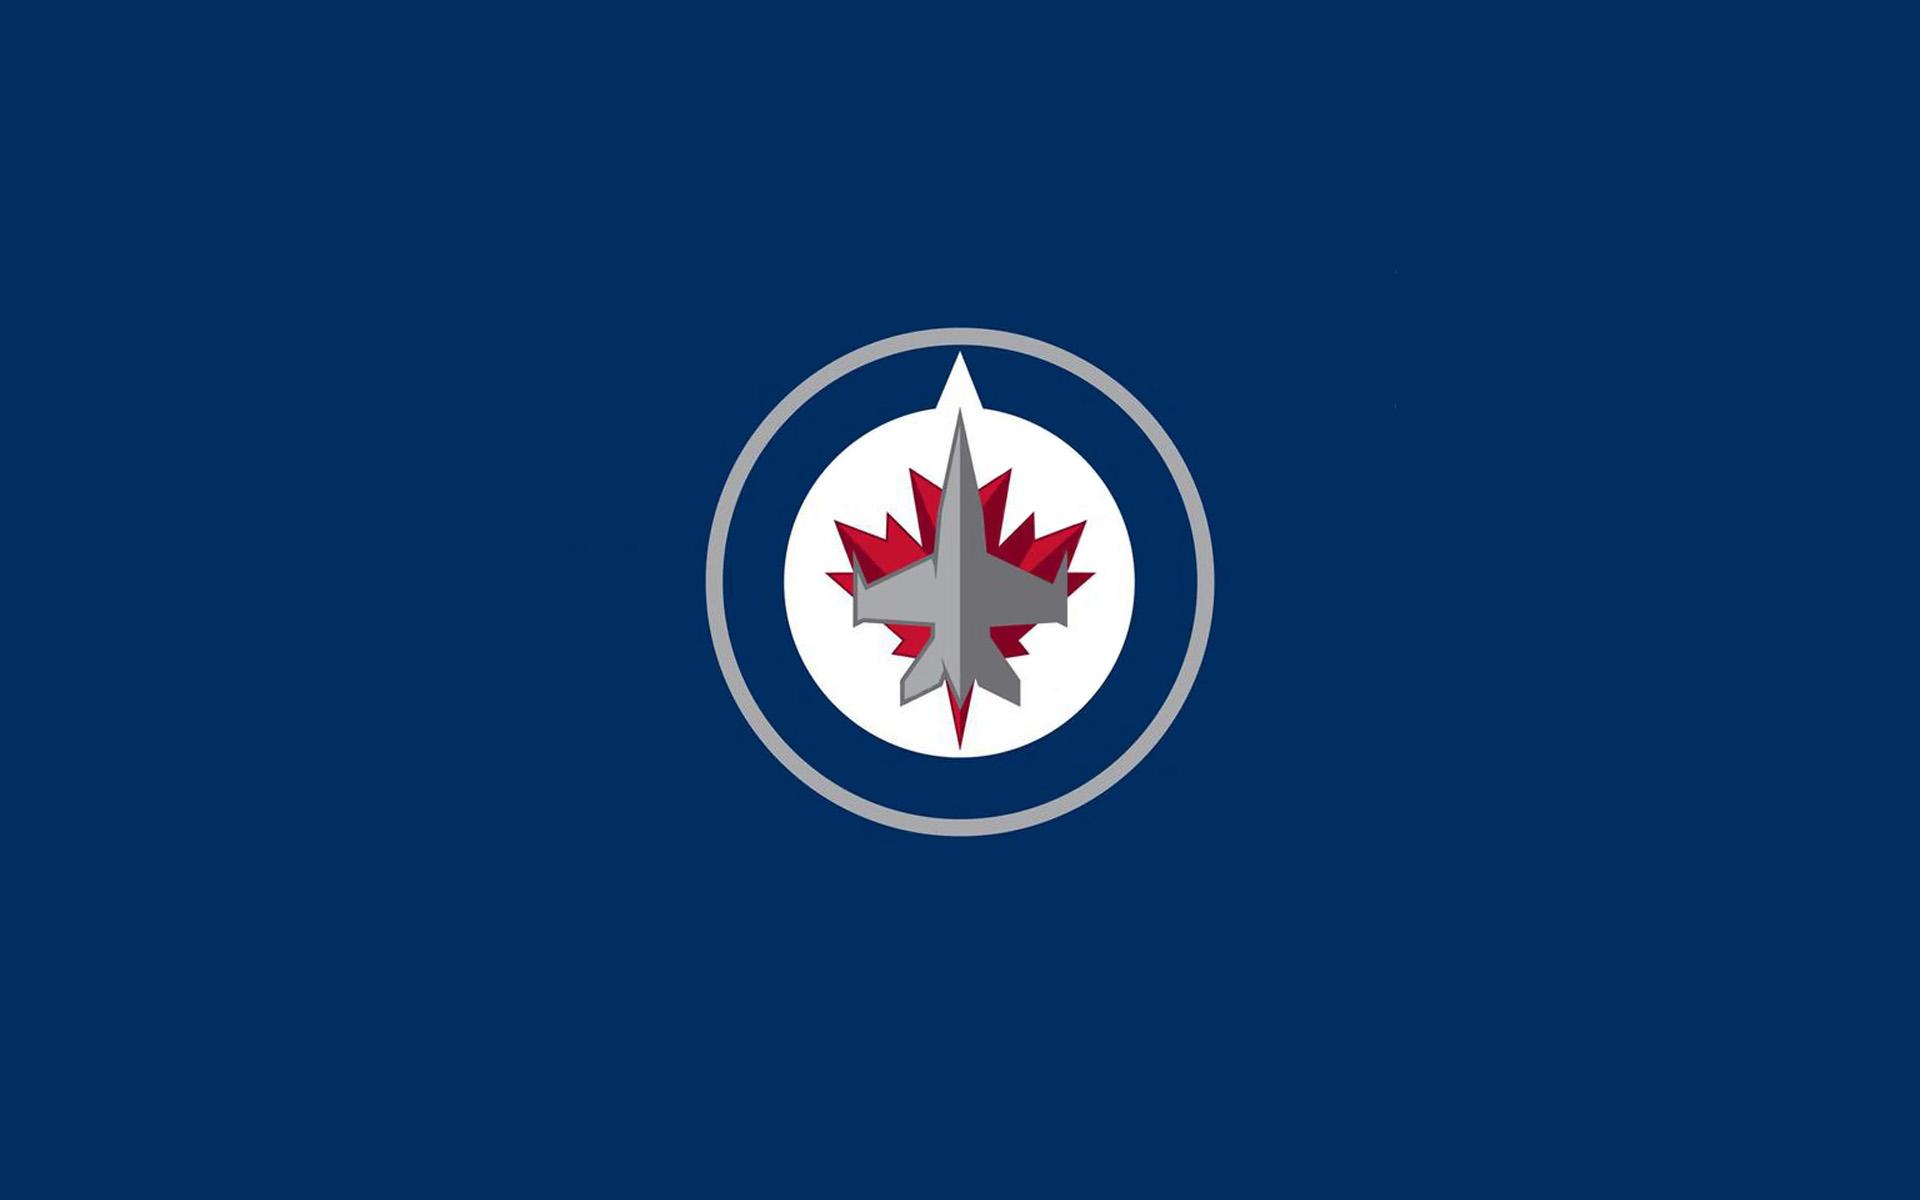 New Winnipeg Jets Logo Wallpapers for Netbooks iPad2 iPhones 1920x1200